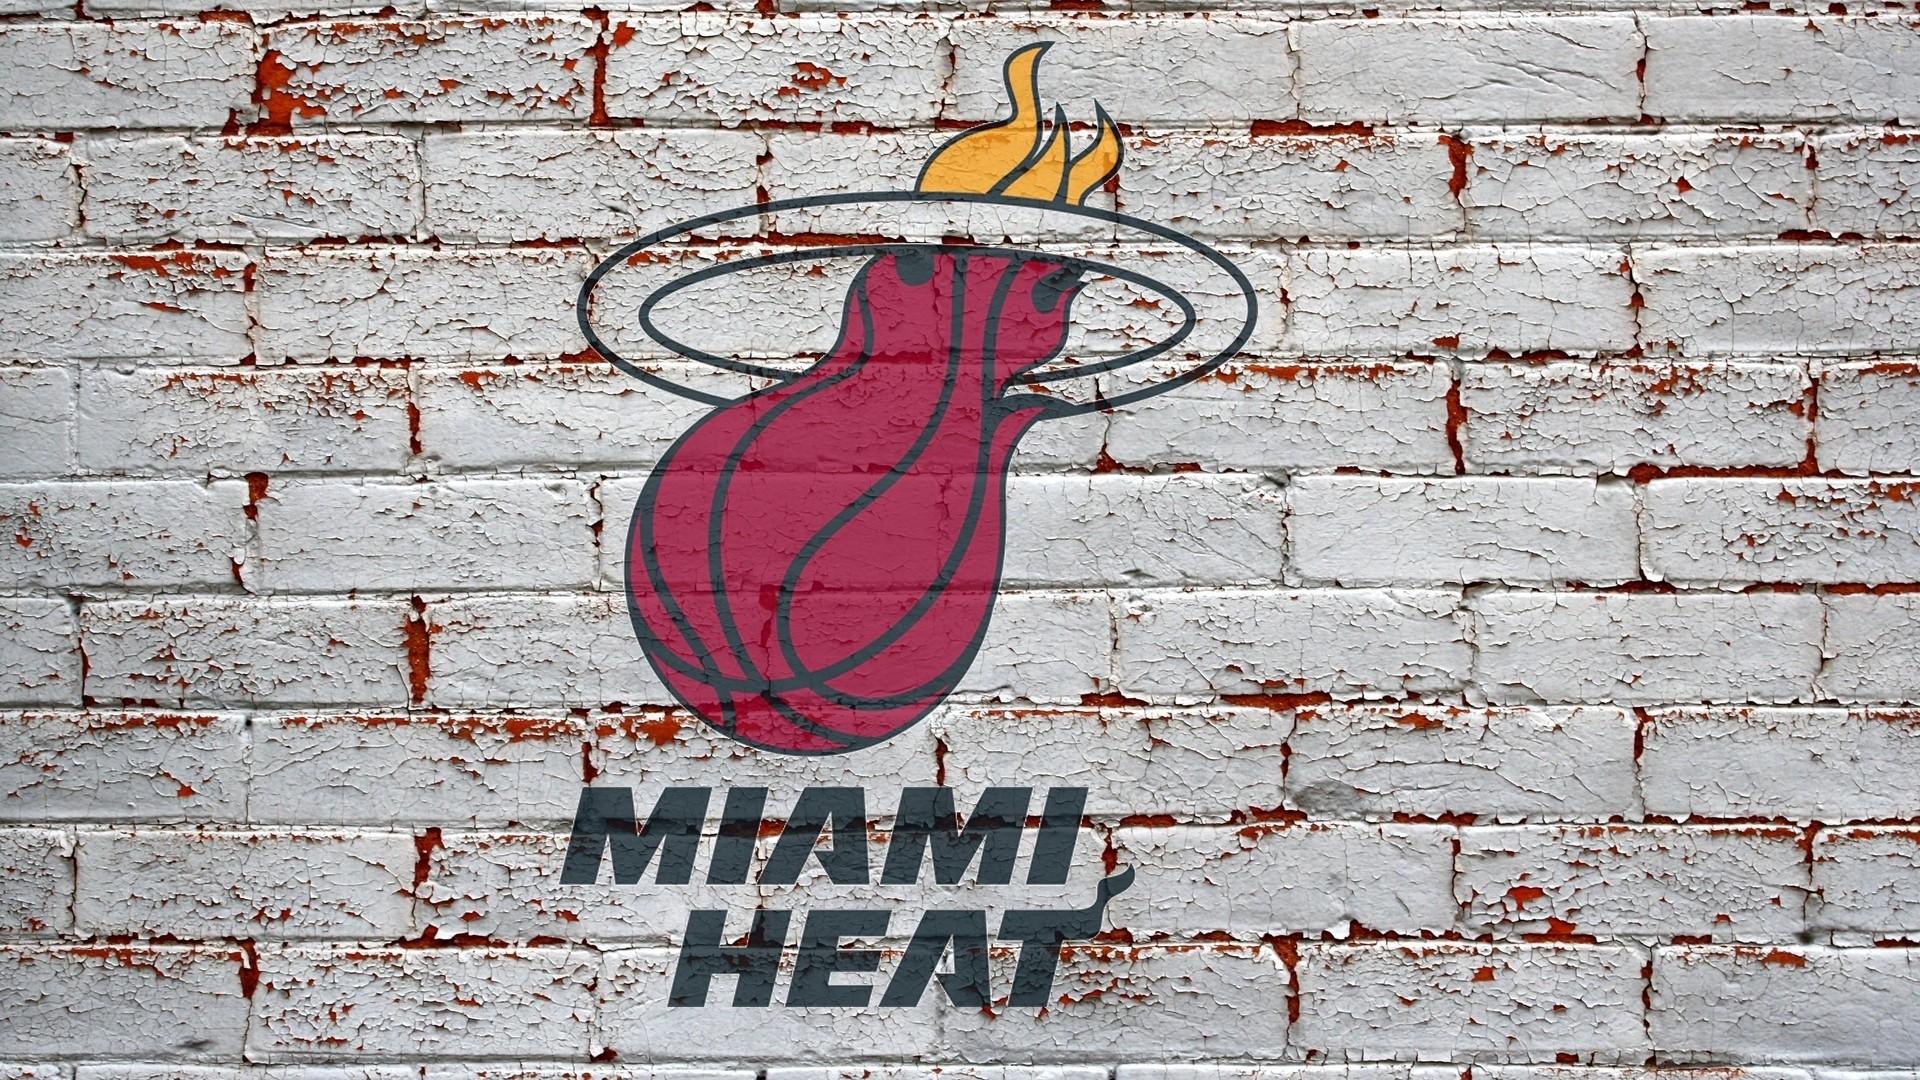 Miami Heat Image